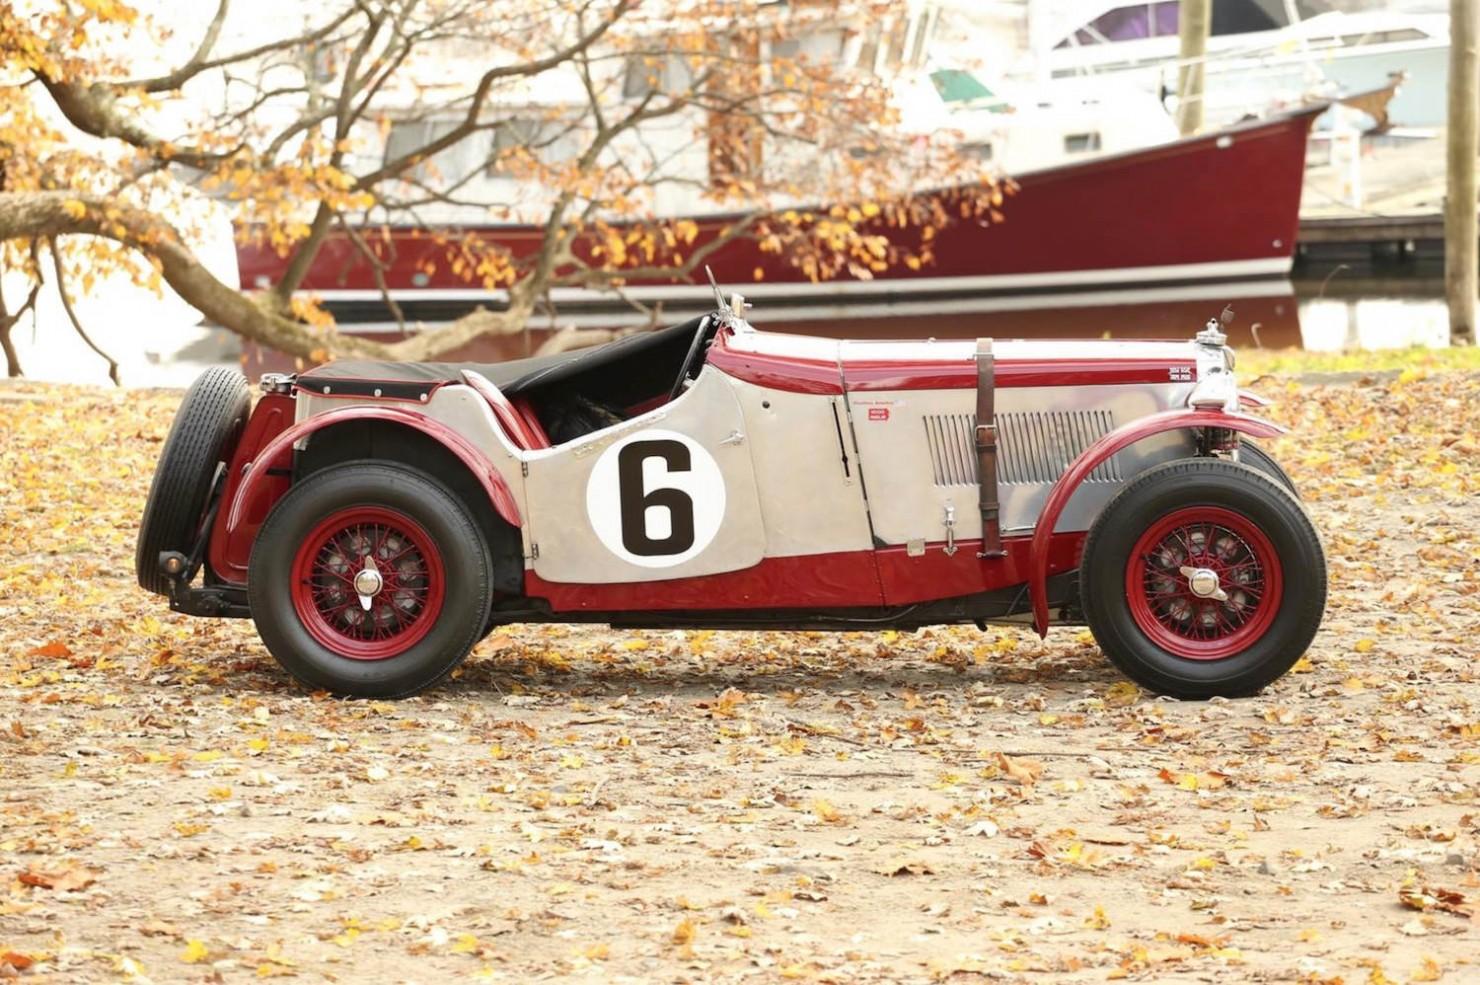 Vintage-MG-Racing-Car-7